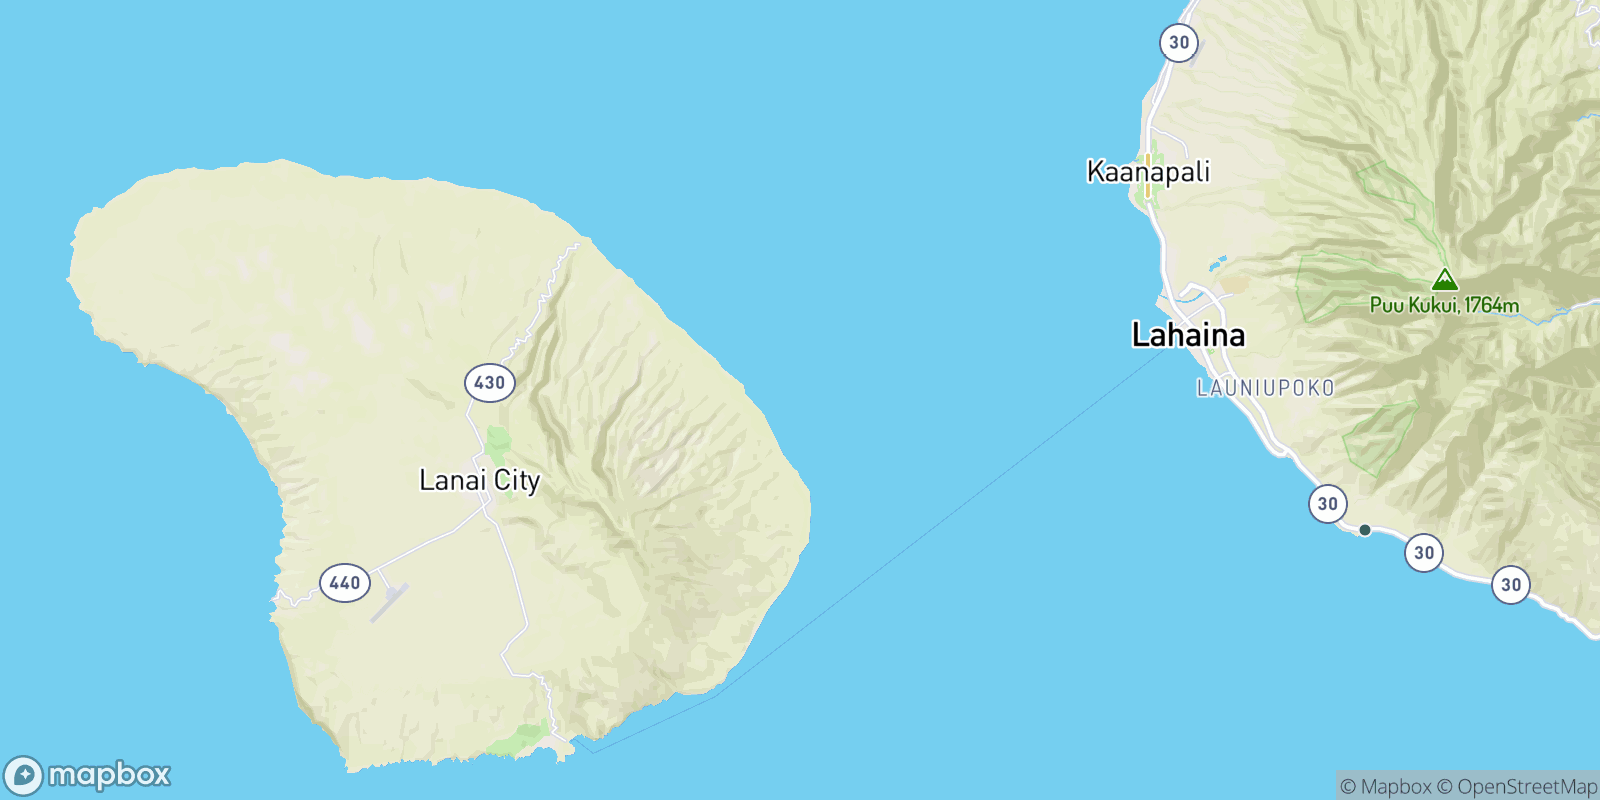 The best camping near Halepalaoa Landing, Hawaii